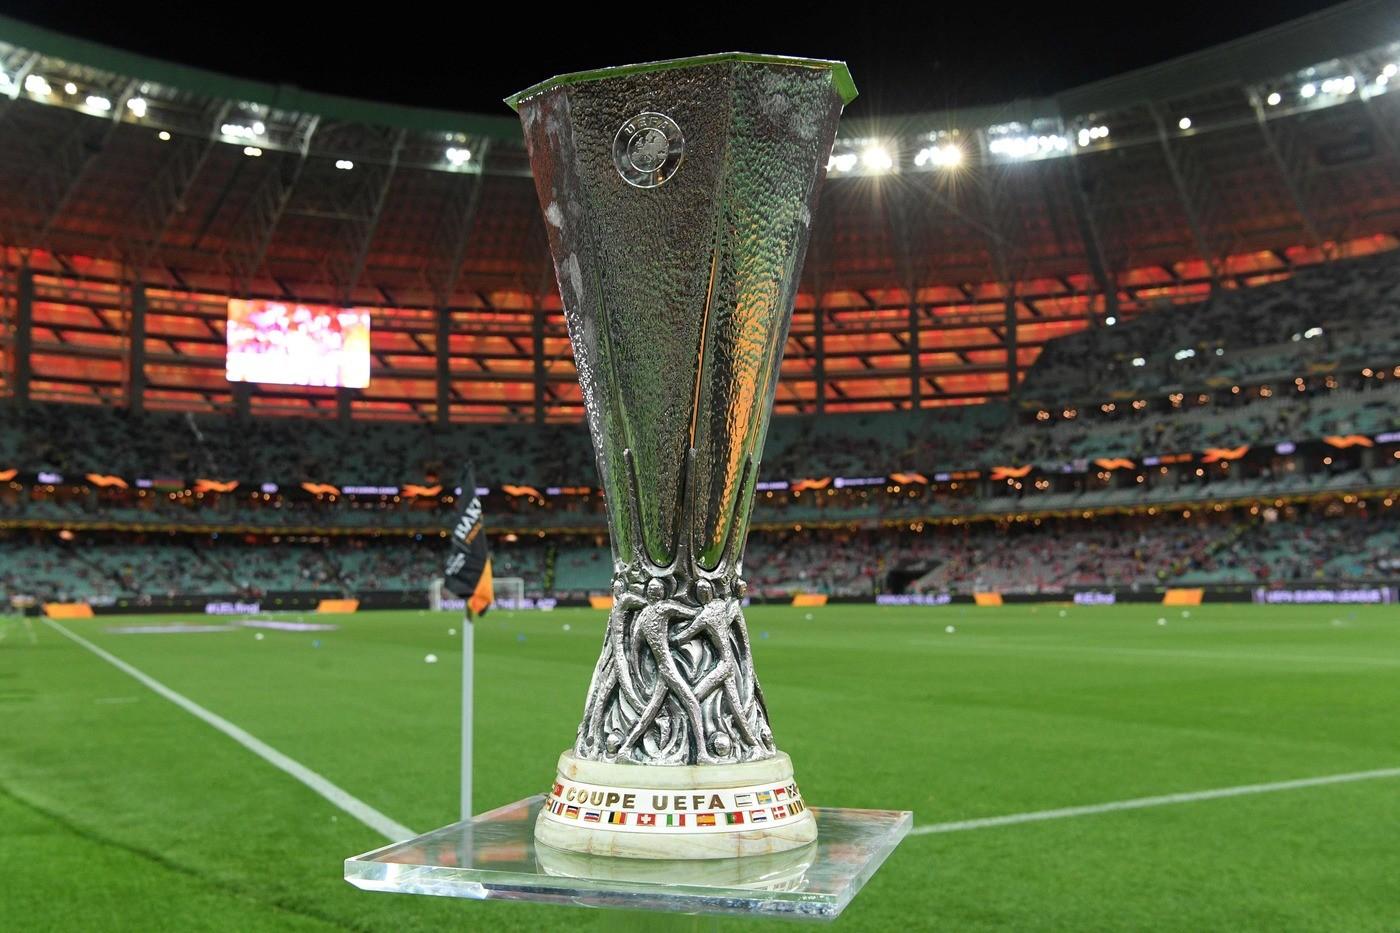 Roma Calendario Europa League.Europa League Il Calendario Di Lazio E Roma Esordio Contro